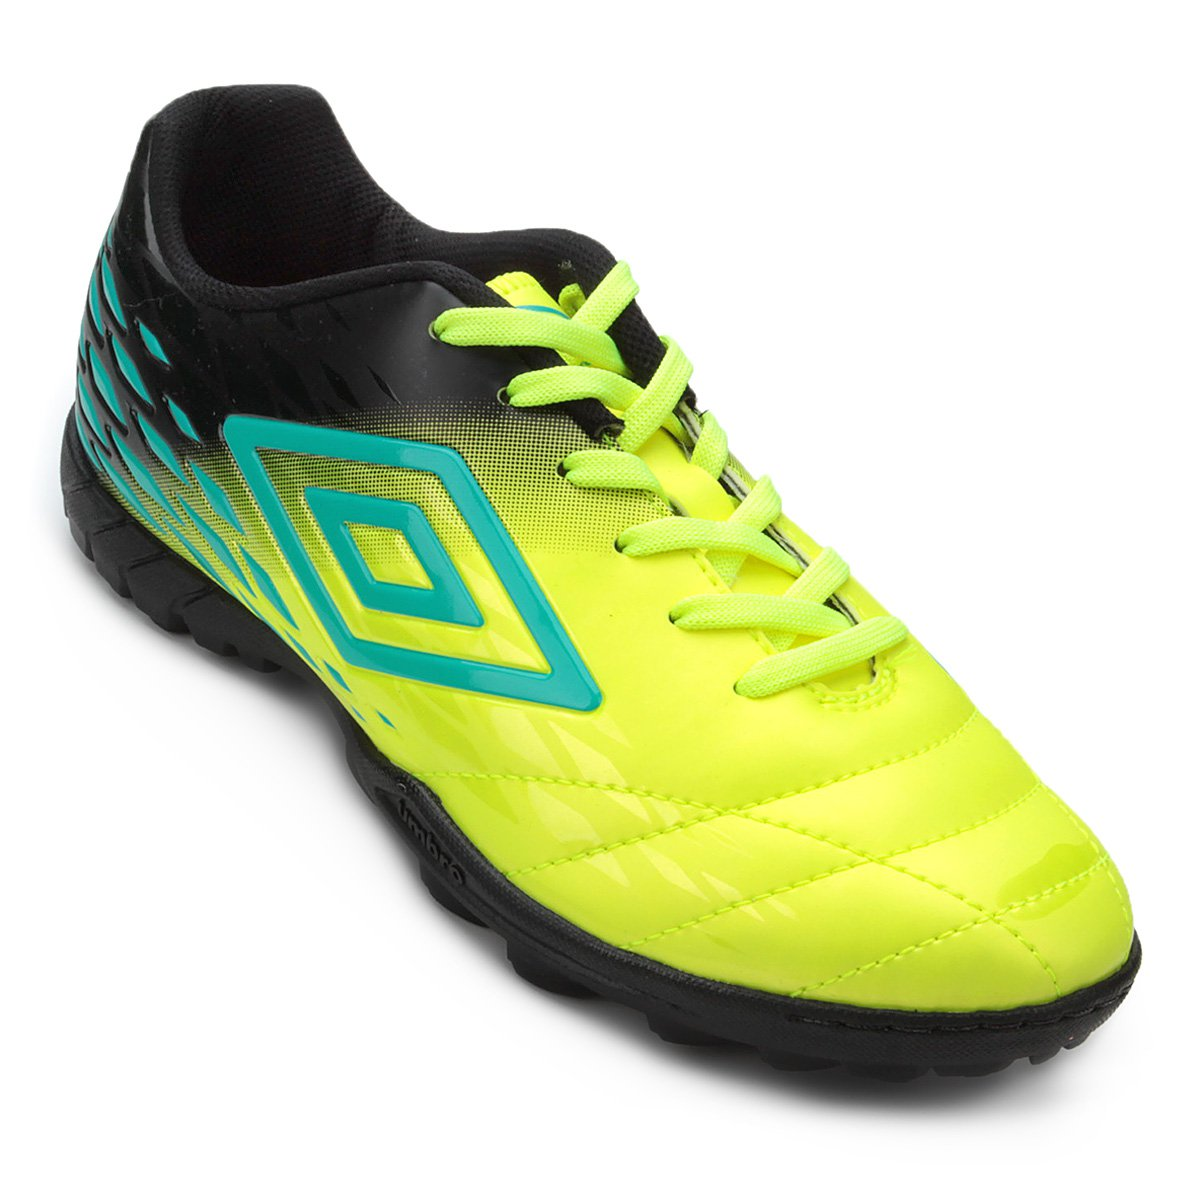 Chuteira Society Umbro Fifty II - Verde e Azul - Compre Agora ... b3e00c38dde77